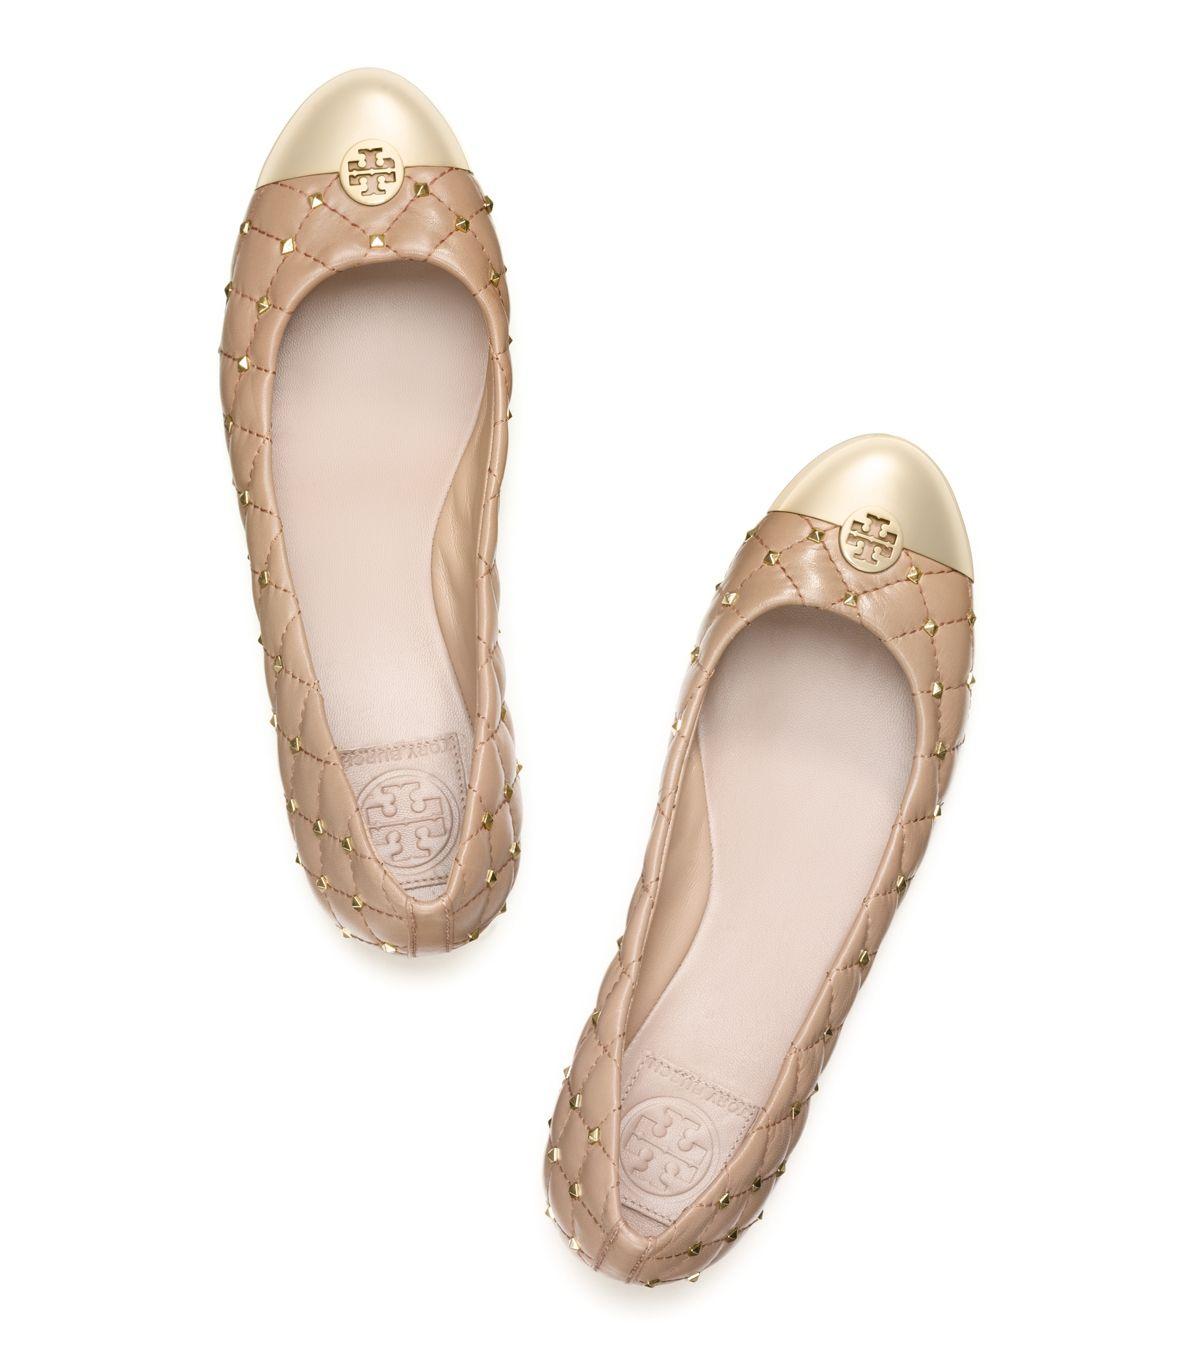 88d8b8fb668 Lyst - Tory Burch Kaitlin Studded Ballet Flat in Natural